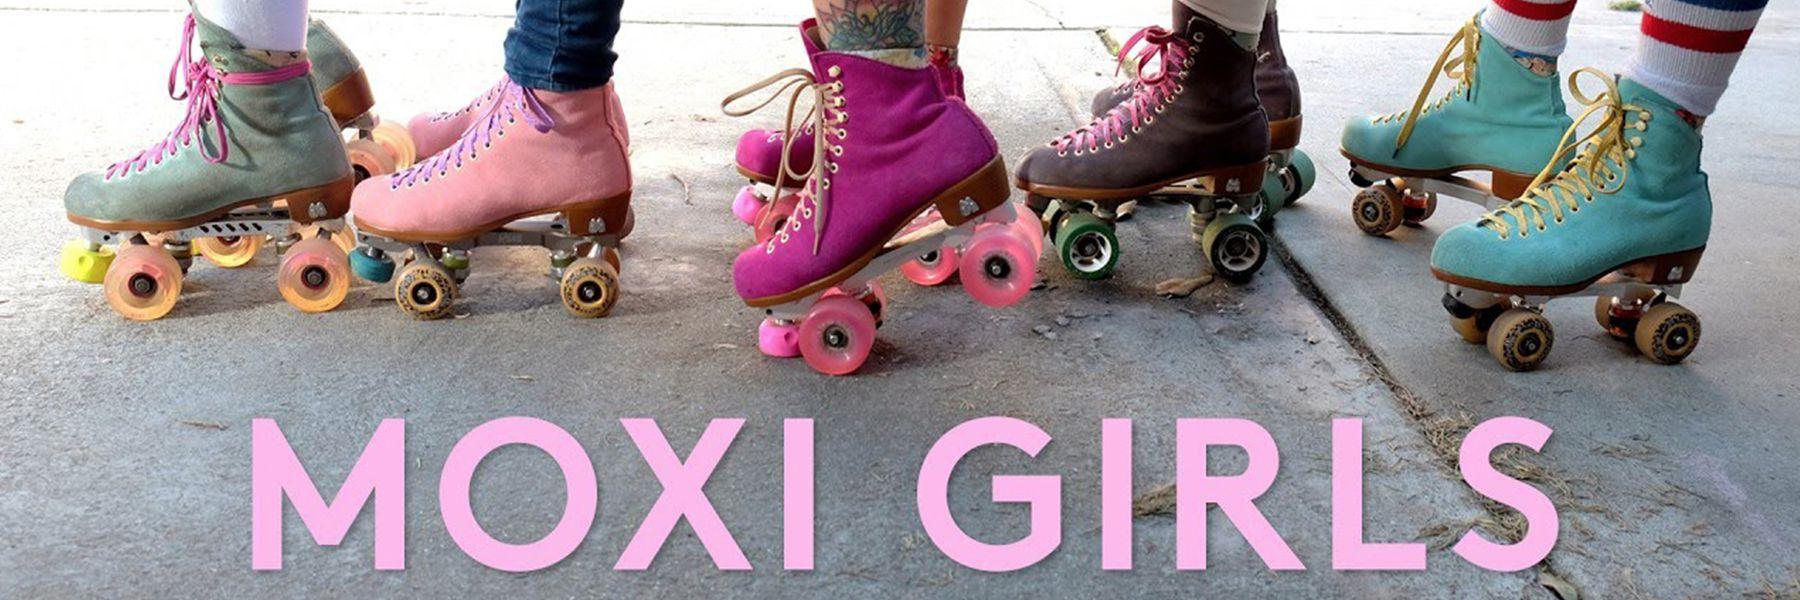 Moxi Roller Skates